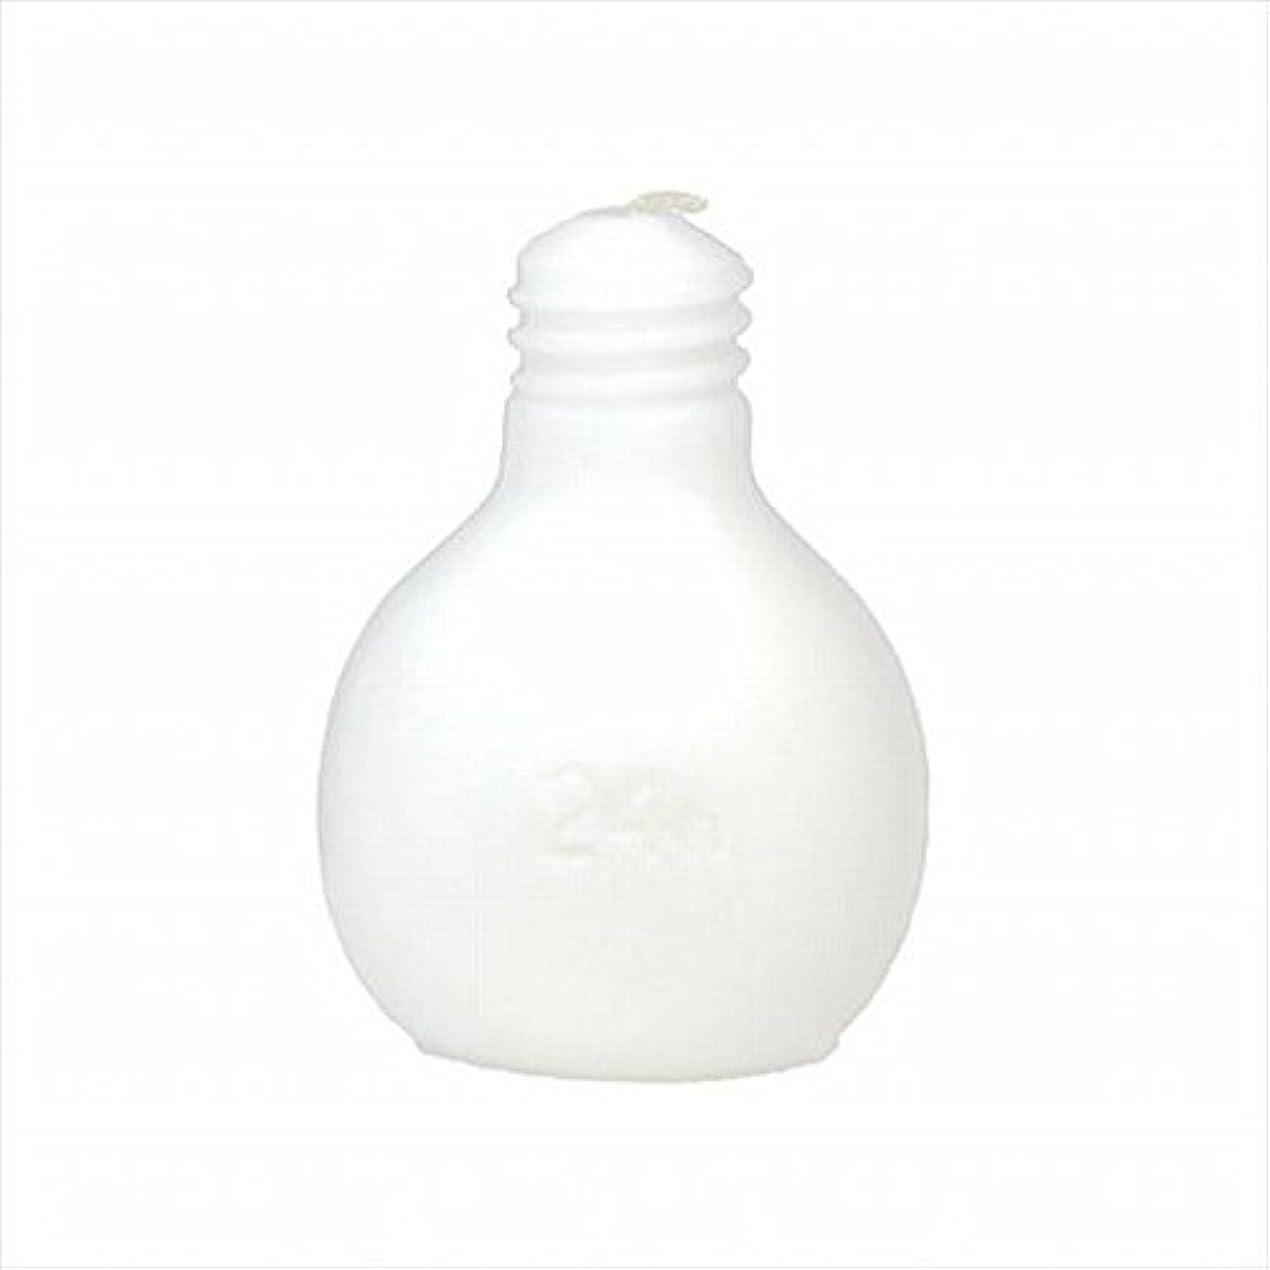 kameyama candle(カメヤマキャンドル) 節電球キャンドル 「 ホワイト 」 キャンドル 75x75x98mm (A4220000W)